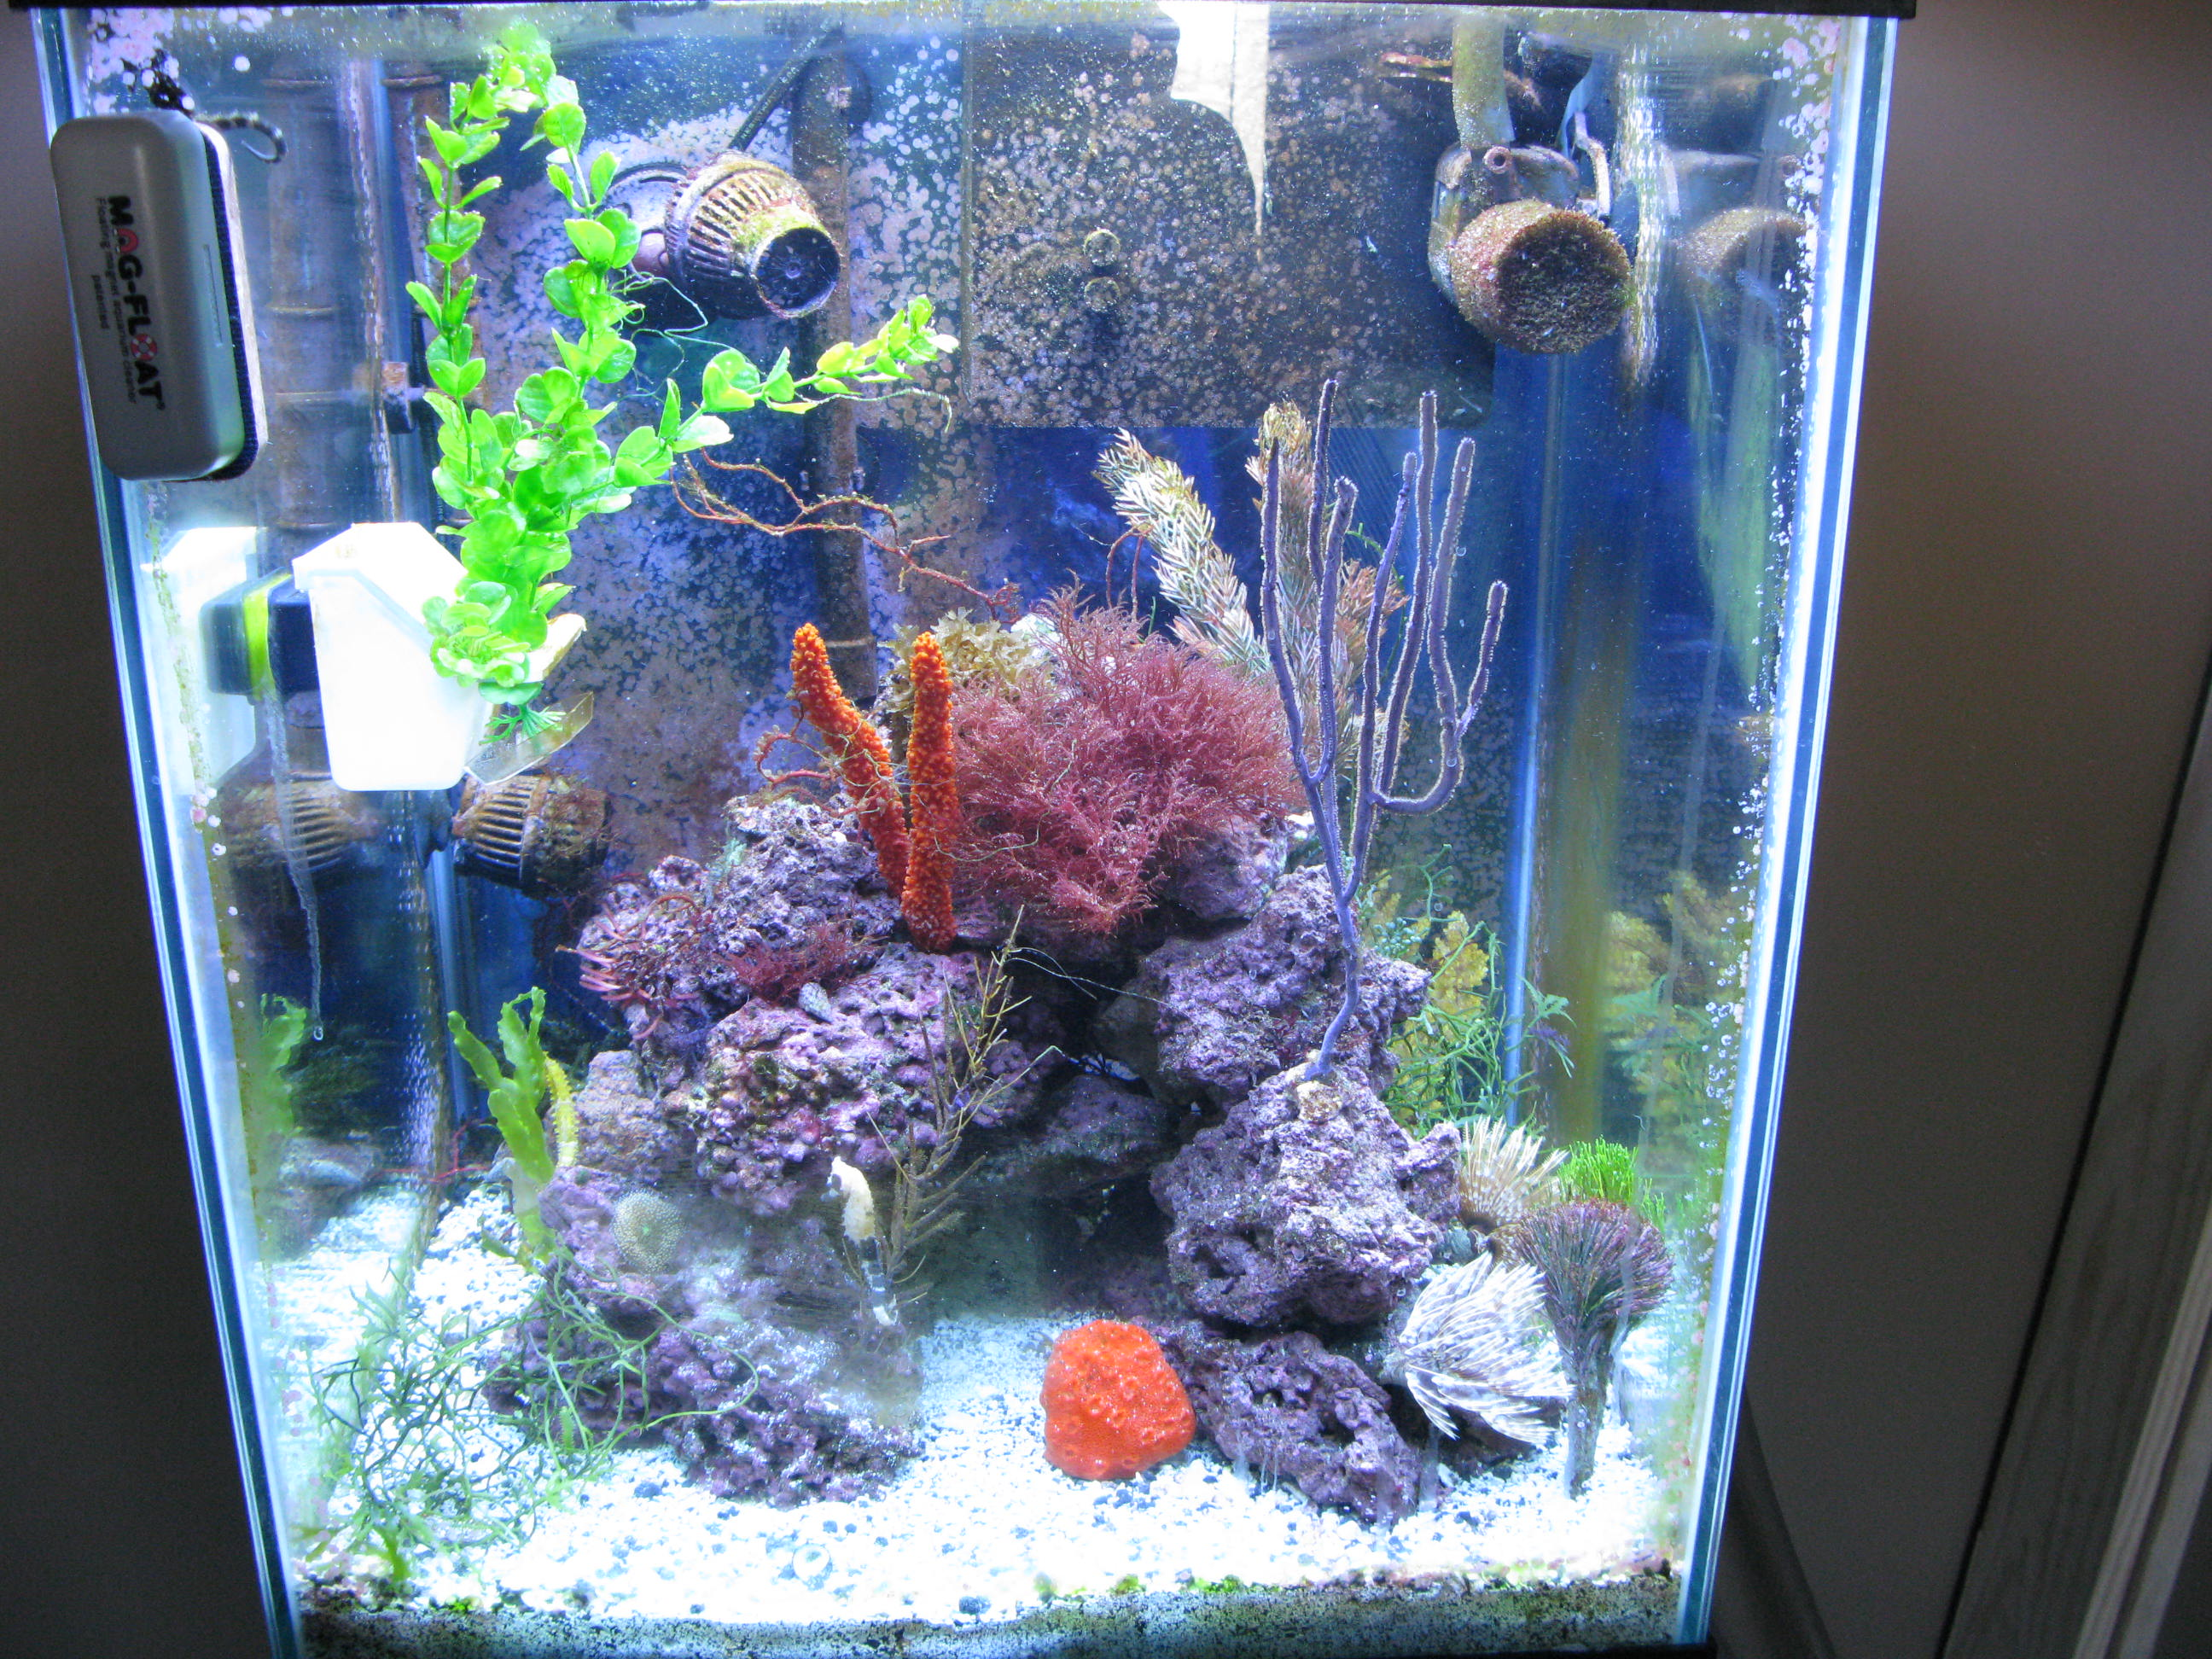 The full seahorse tank shot thread saltwaterfish forum for Seahorse fish tank